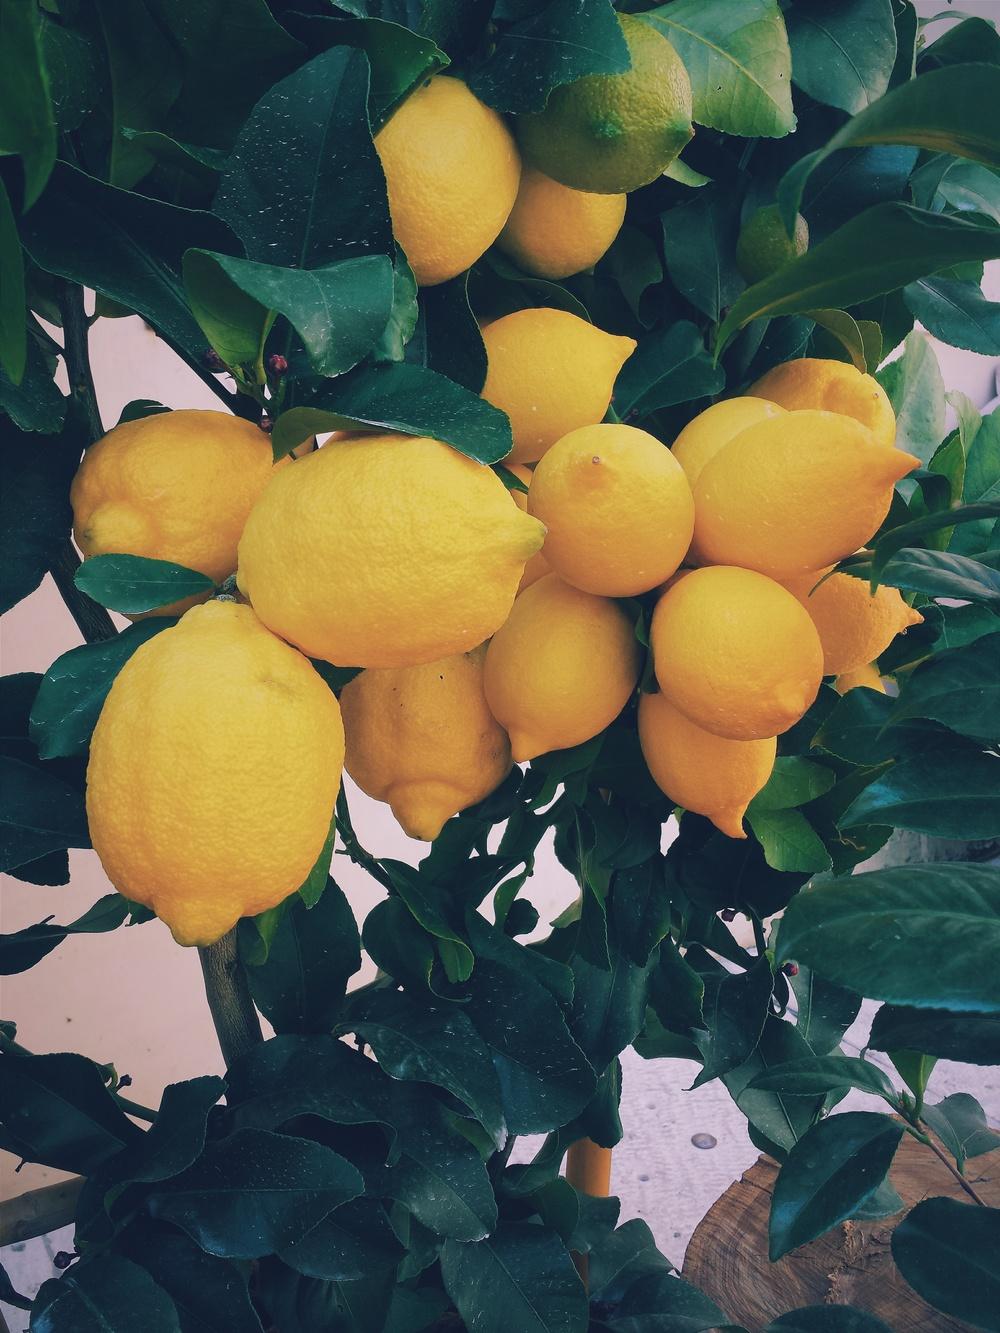 lemons unsplash.jpeg